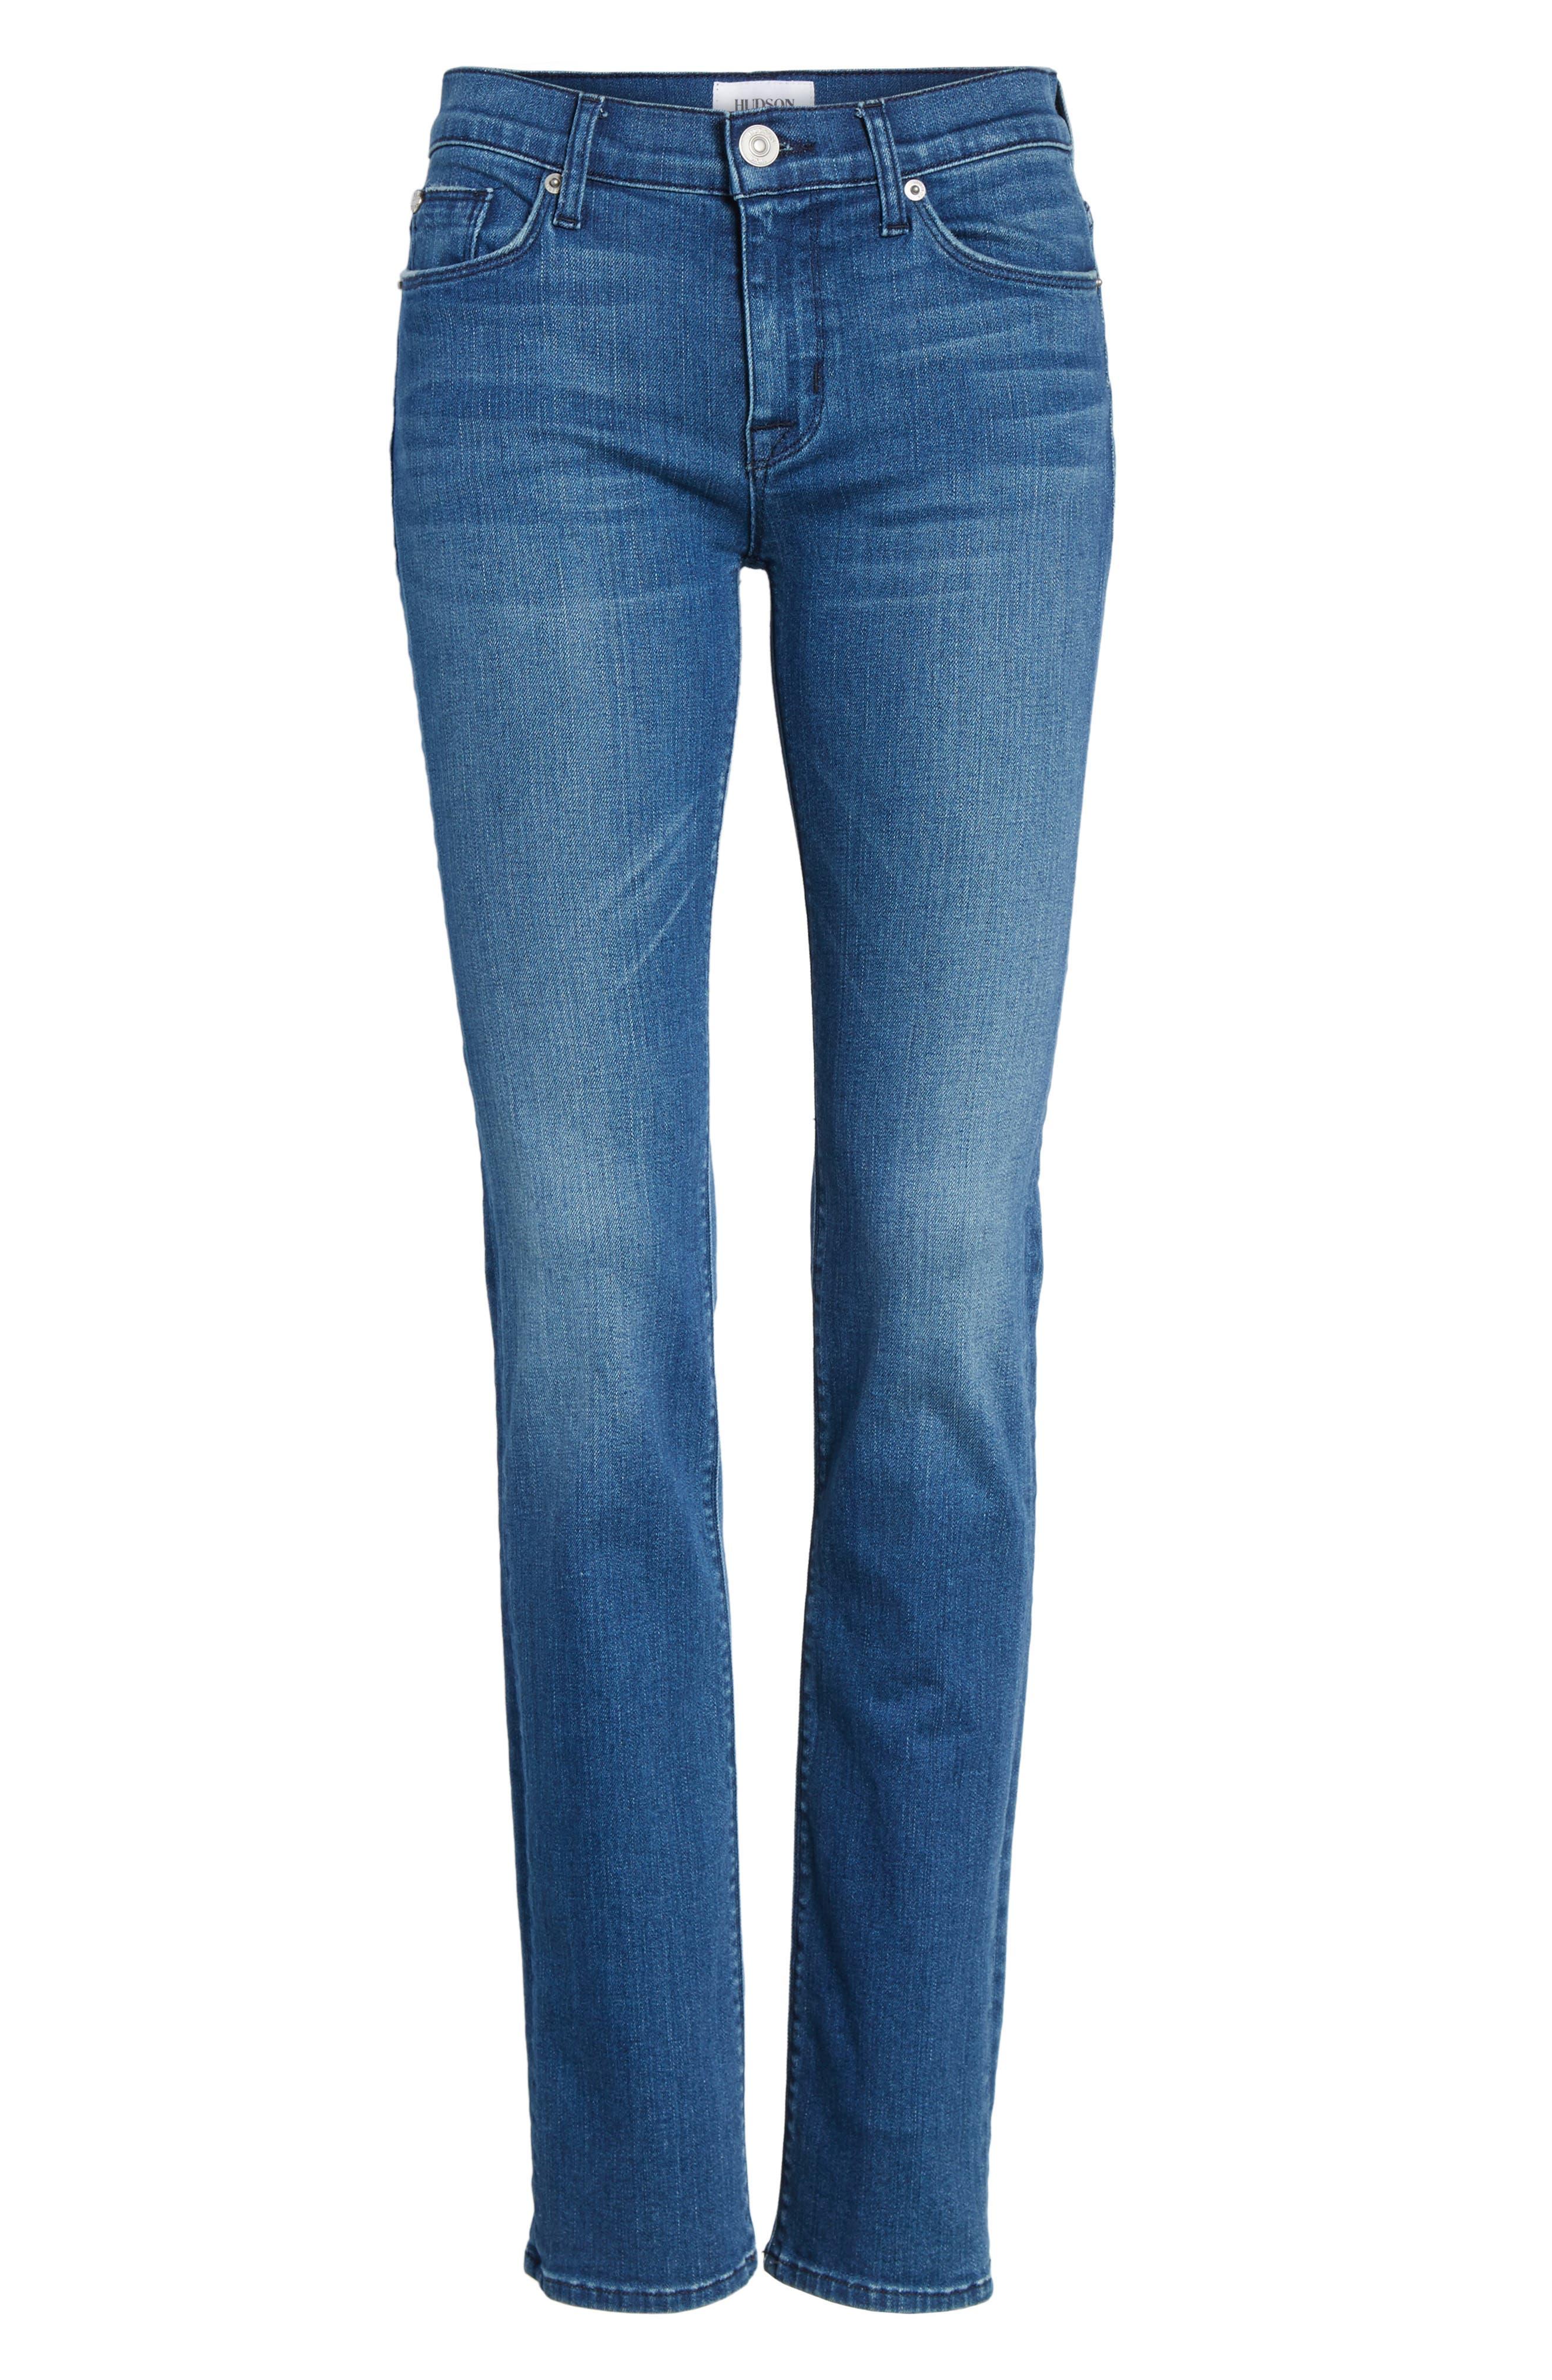 Tilda Cigarette Leg Jeans,                             Alternate thumbnail 6, color,